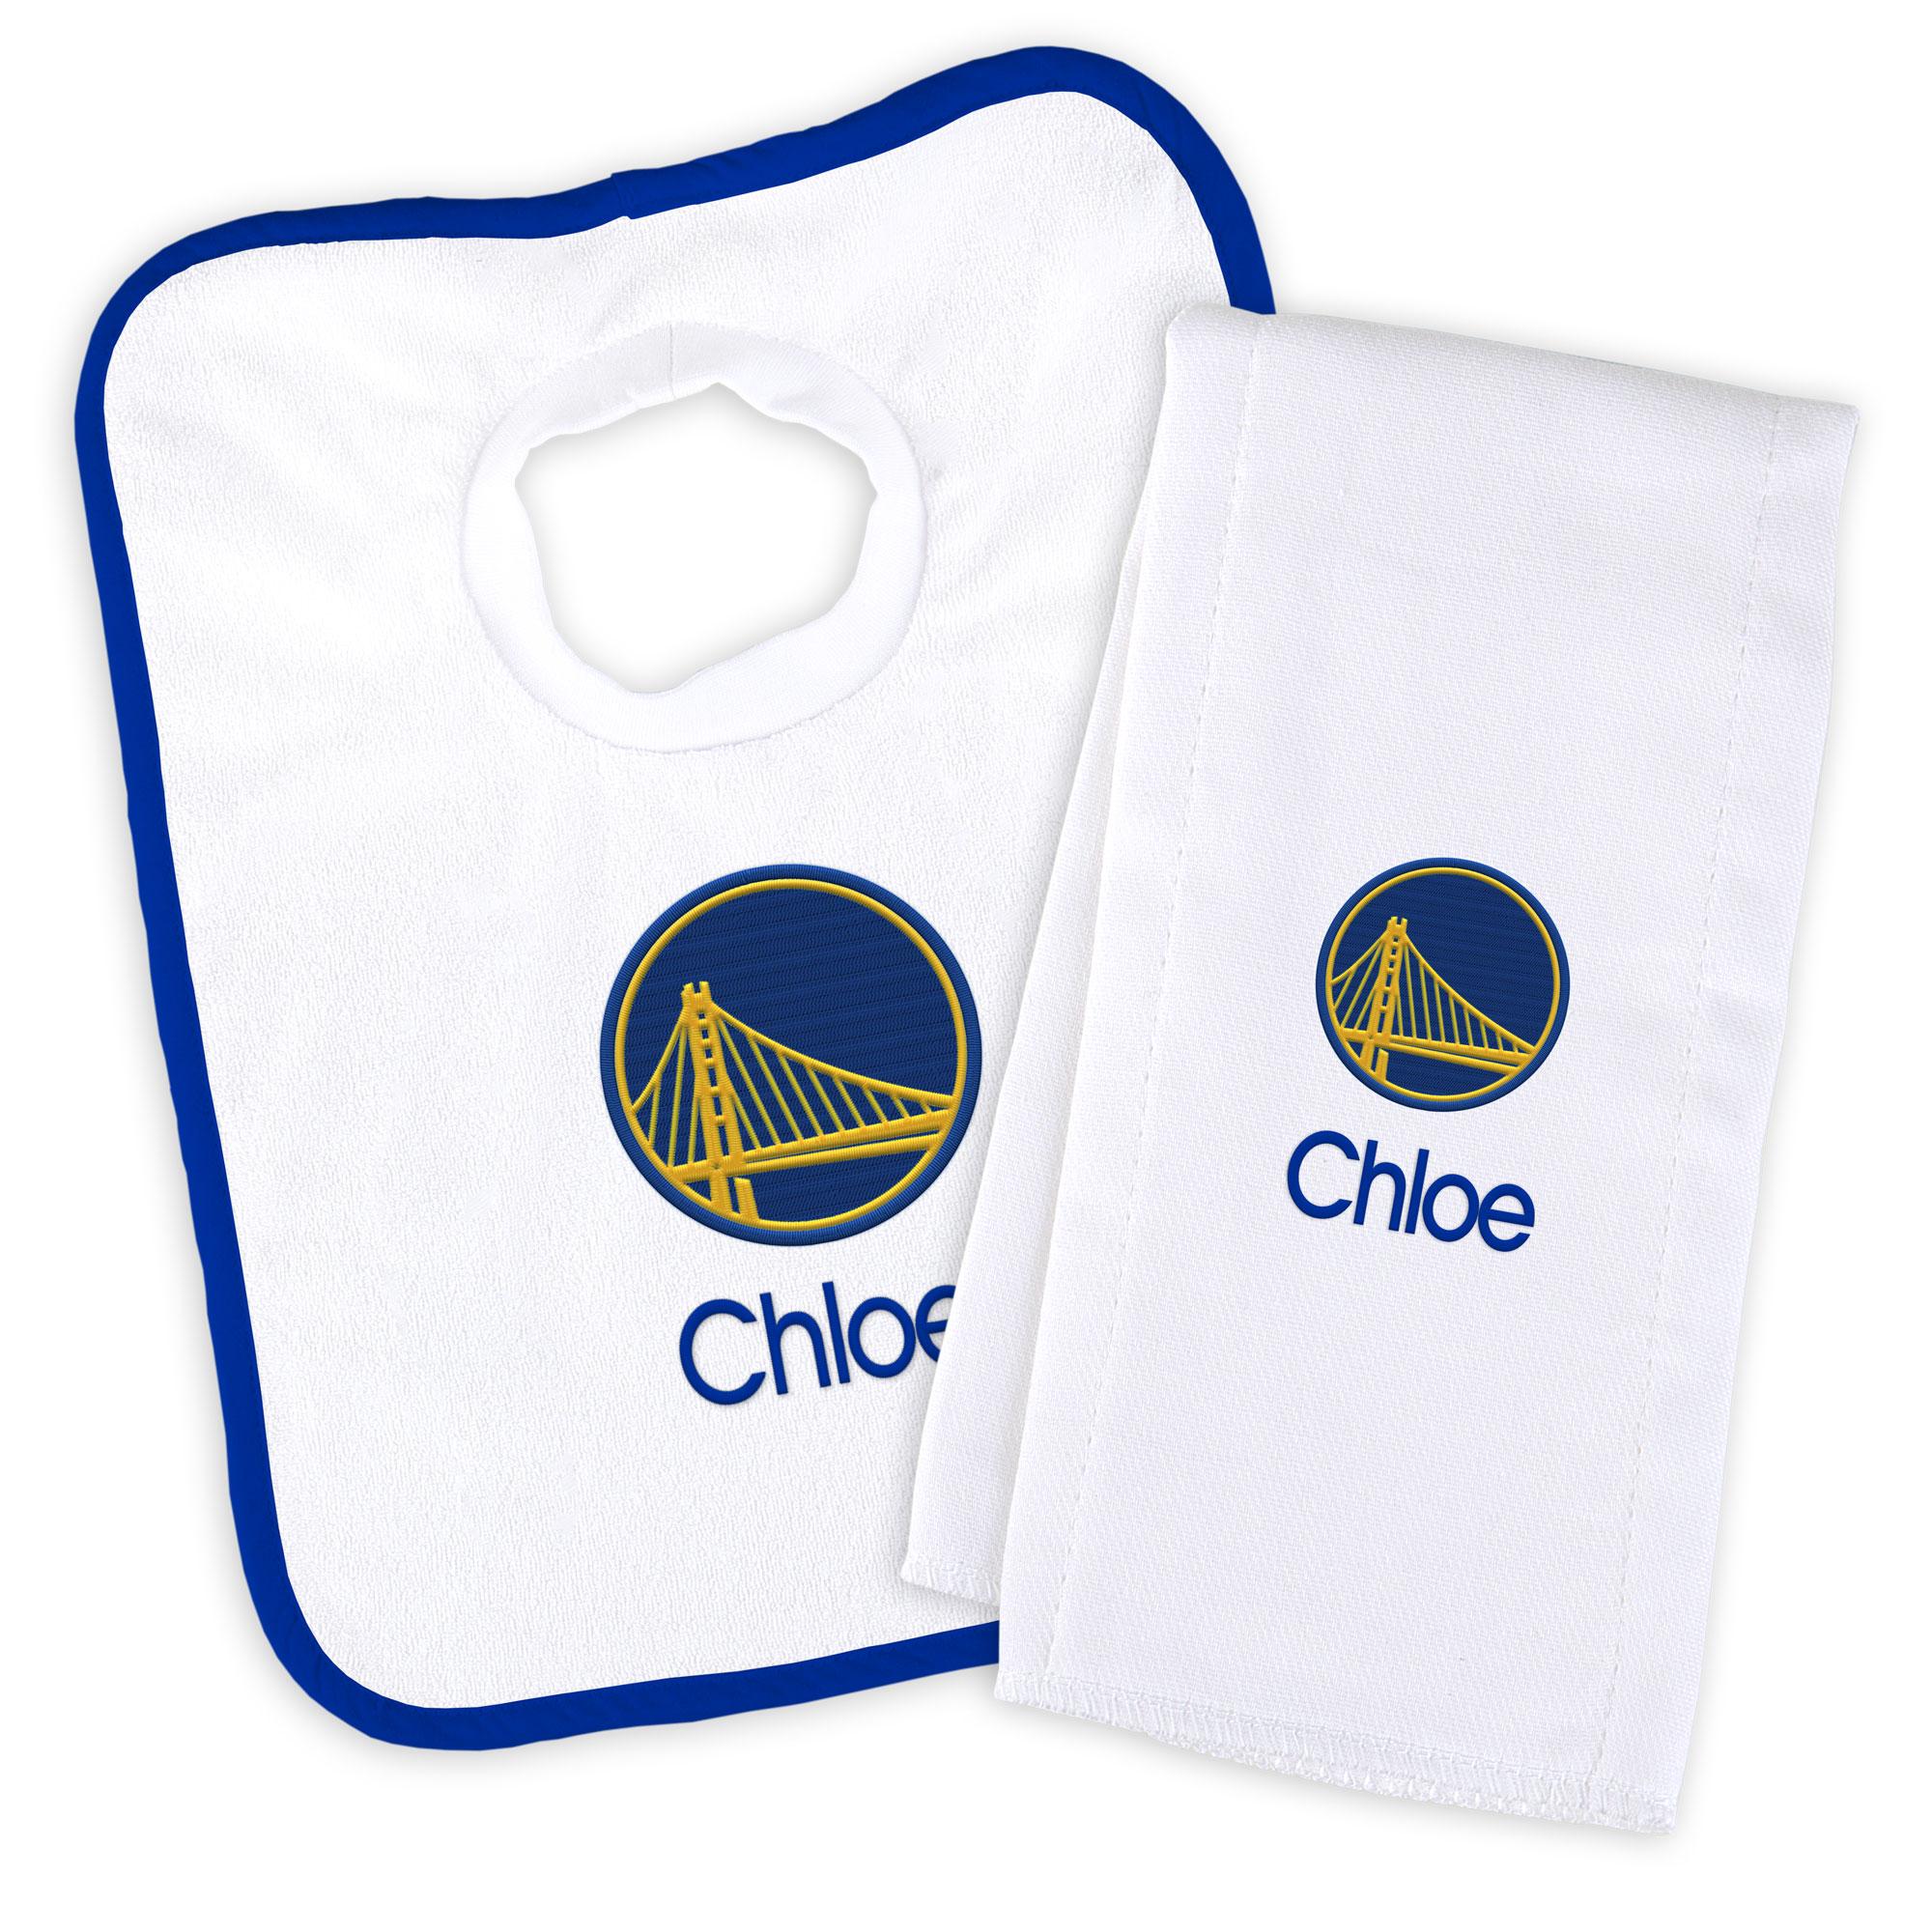 Golden State Warriors Newborn & Infant Personalized Bib & Burp Cloth Set - White